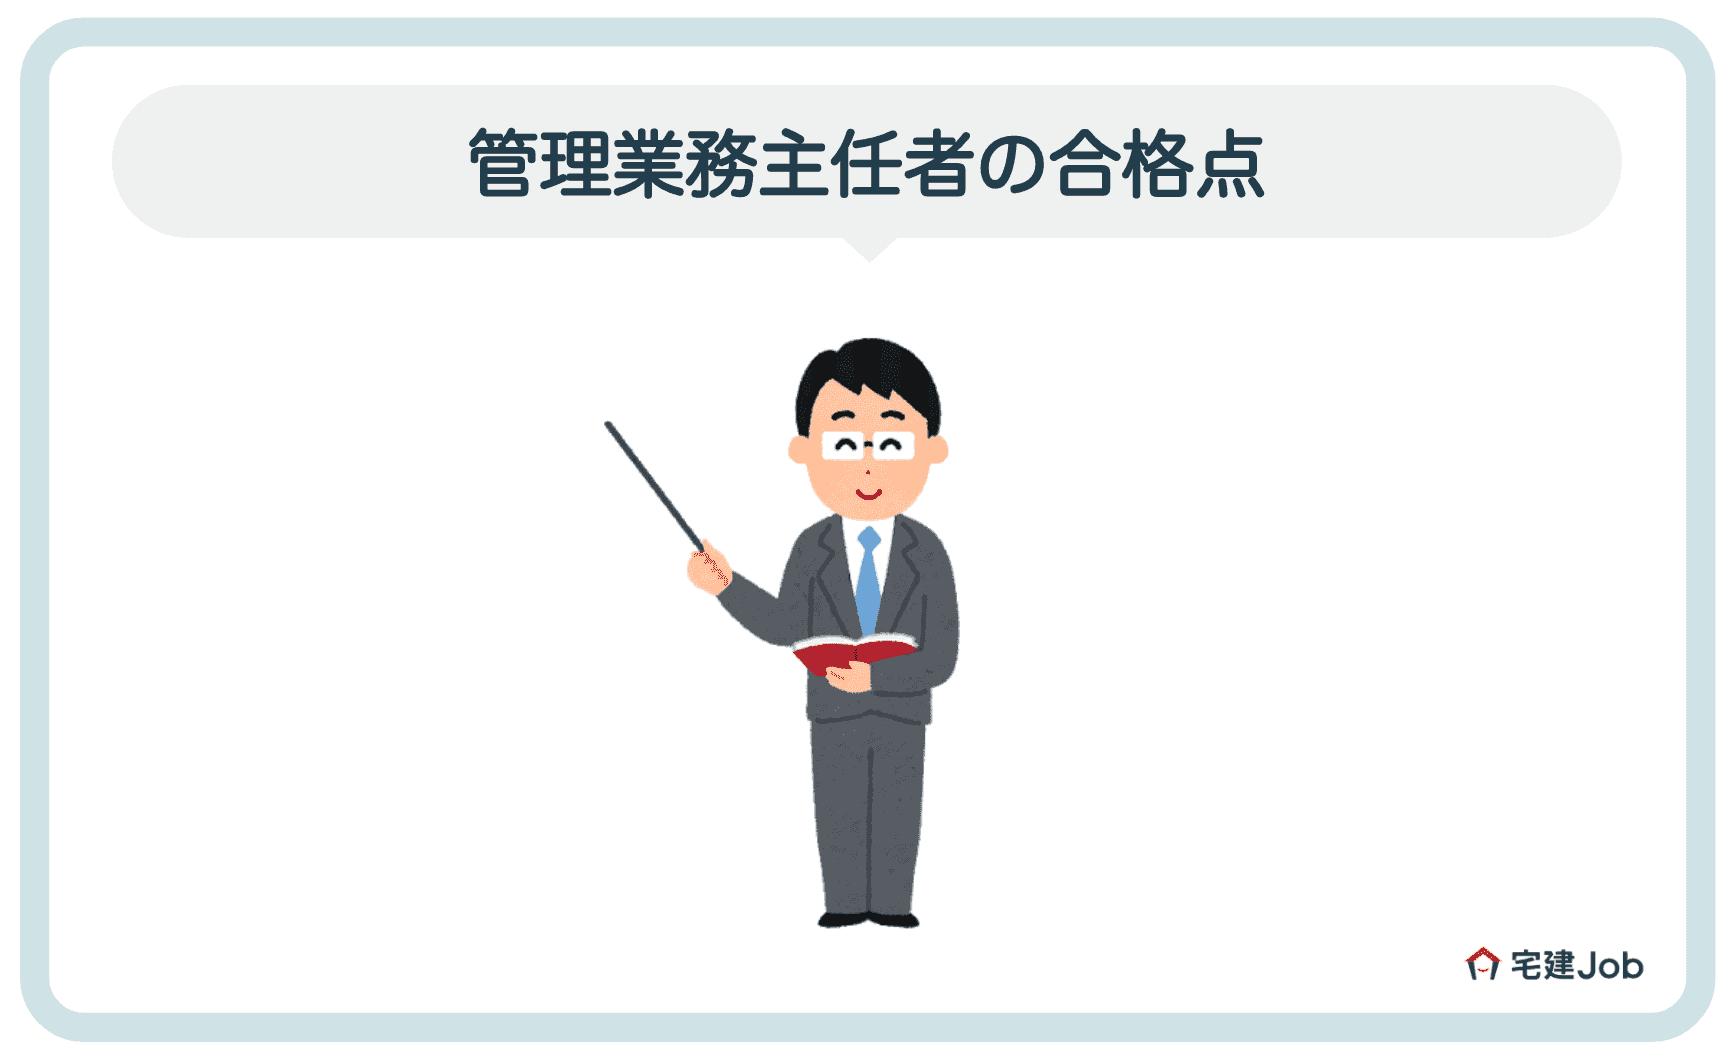 1.管理業務主任者試験2019(令和元年)の合格点は34点